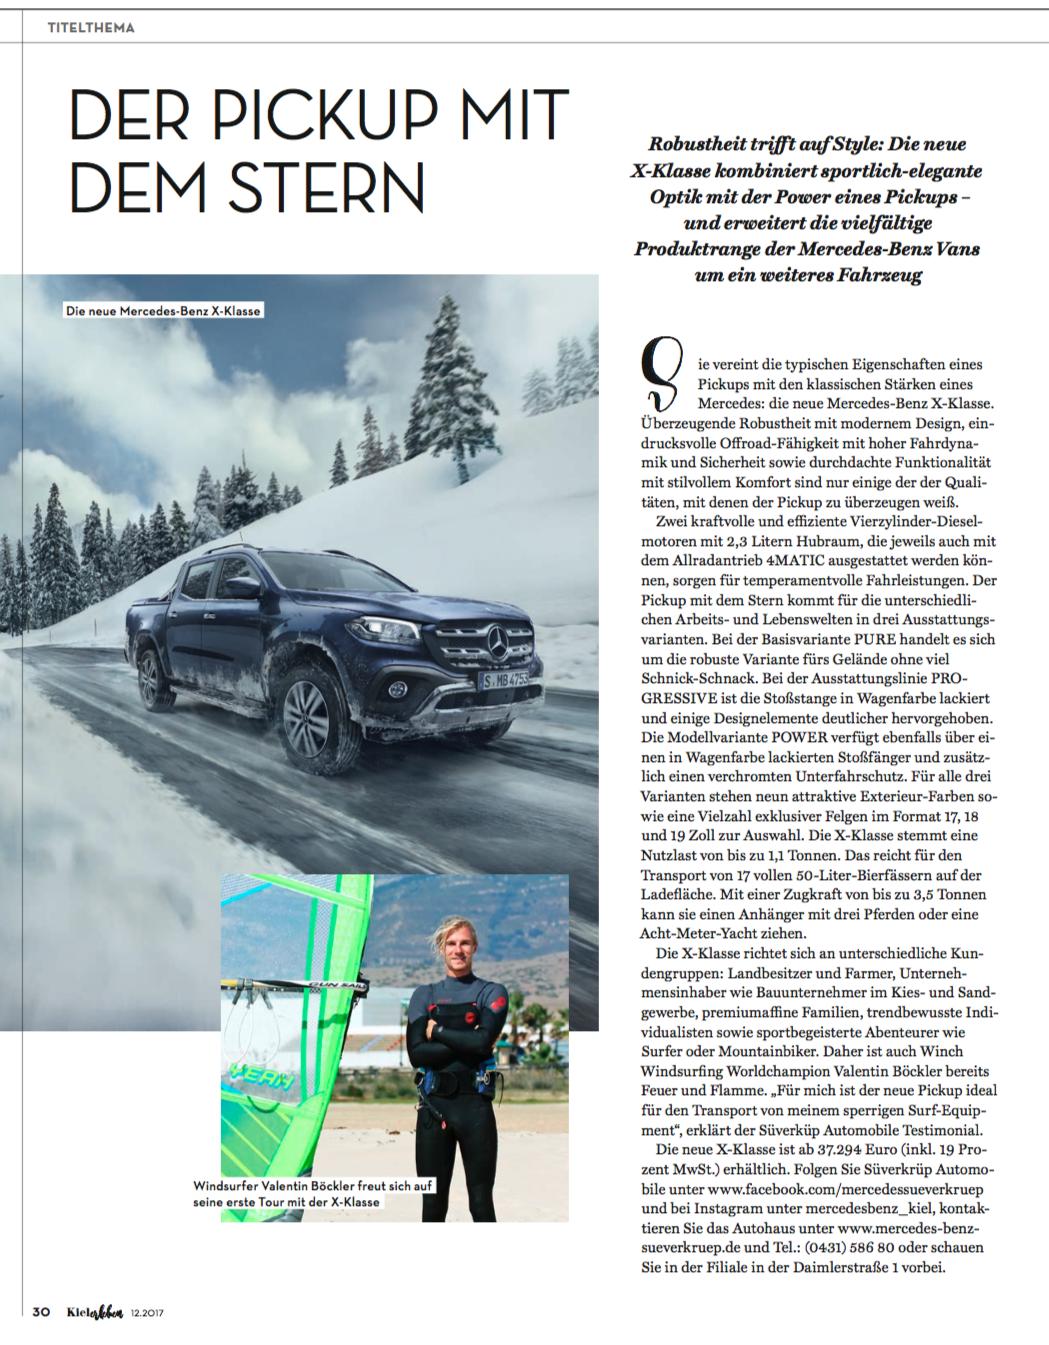 Kielerleben Mercedes X-Klasse Testimonial